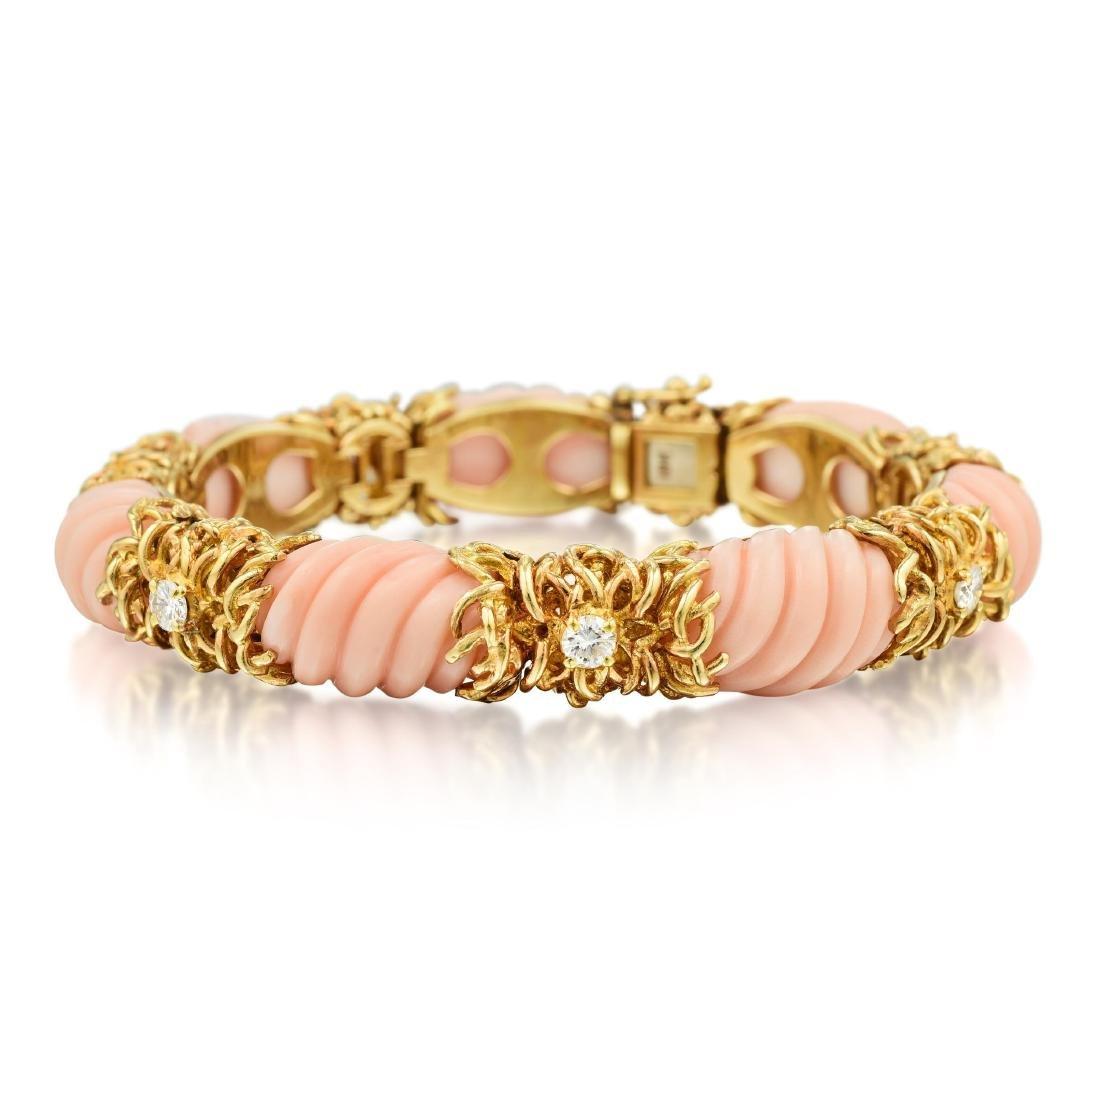 A Coral and Diamond Bracelet